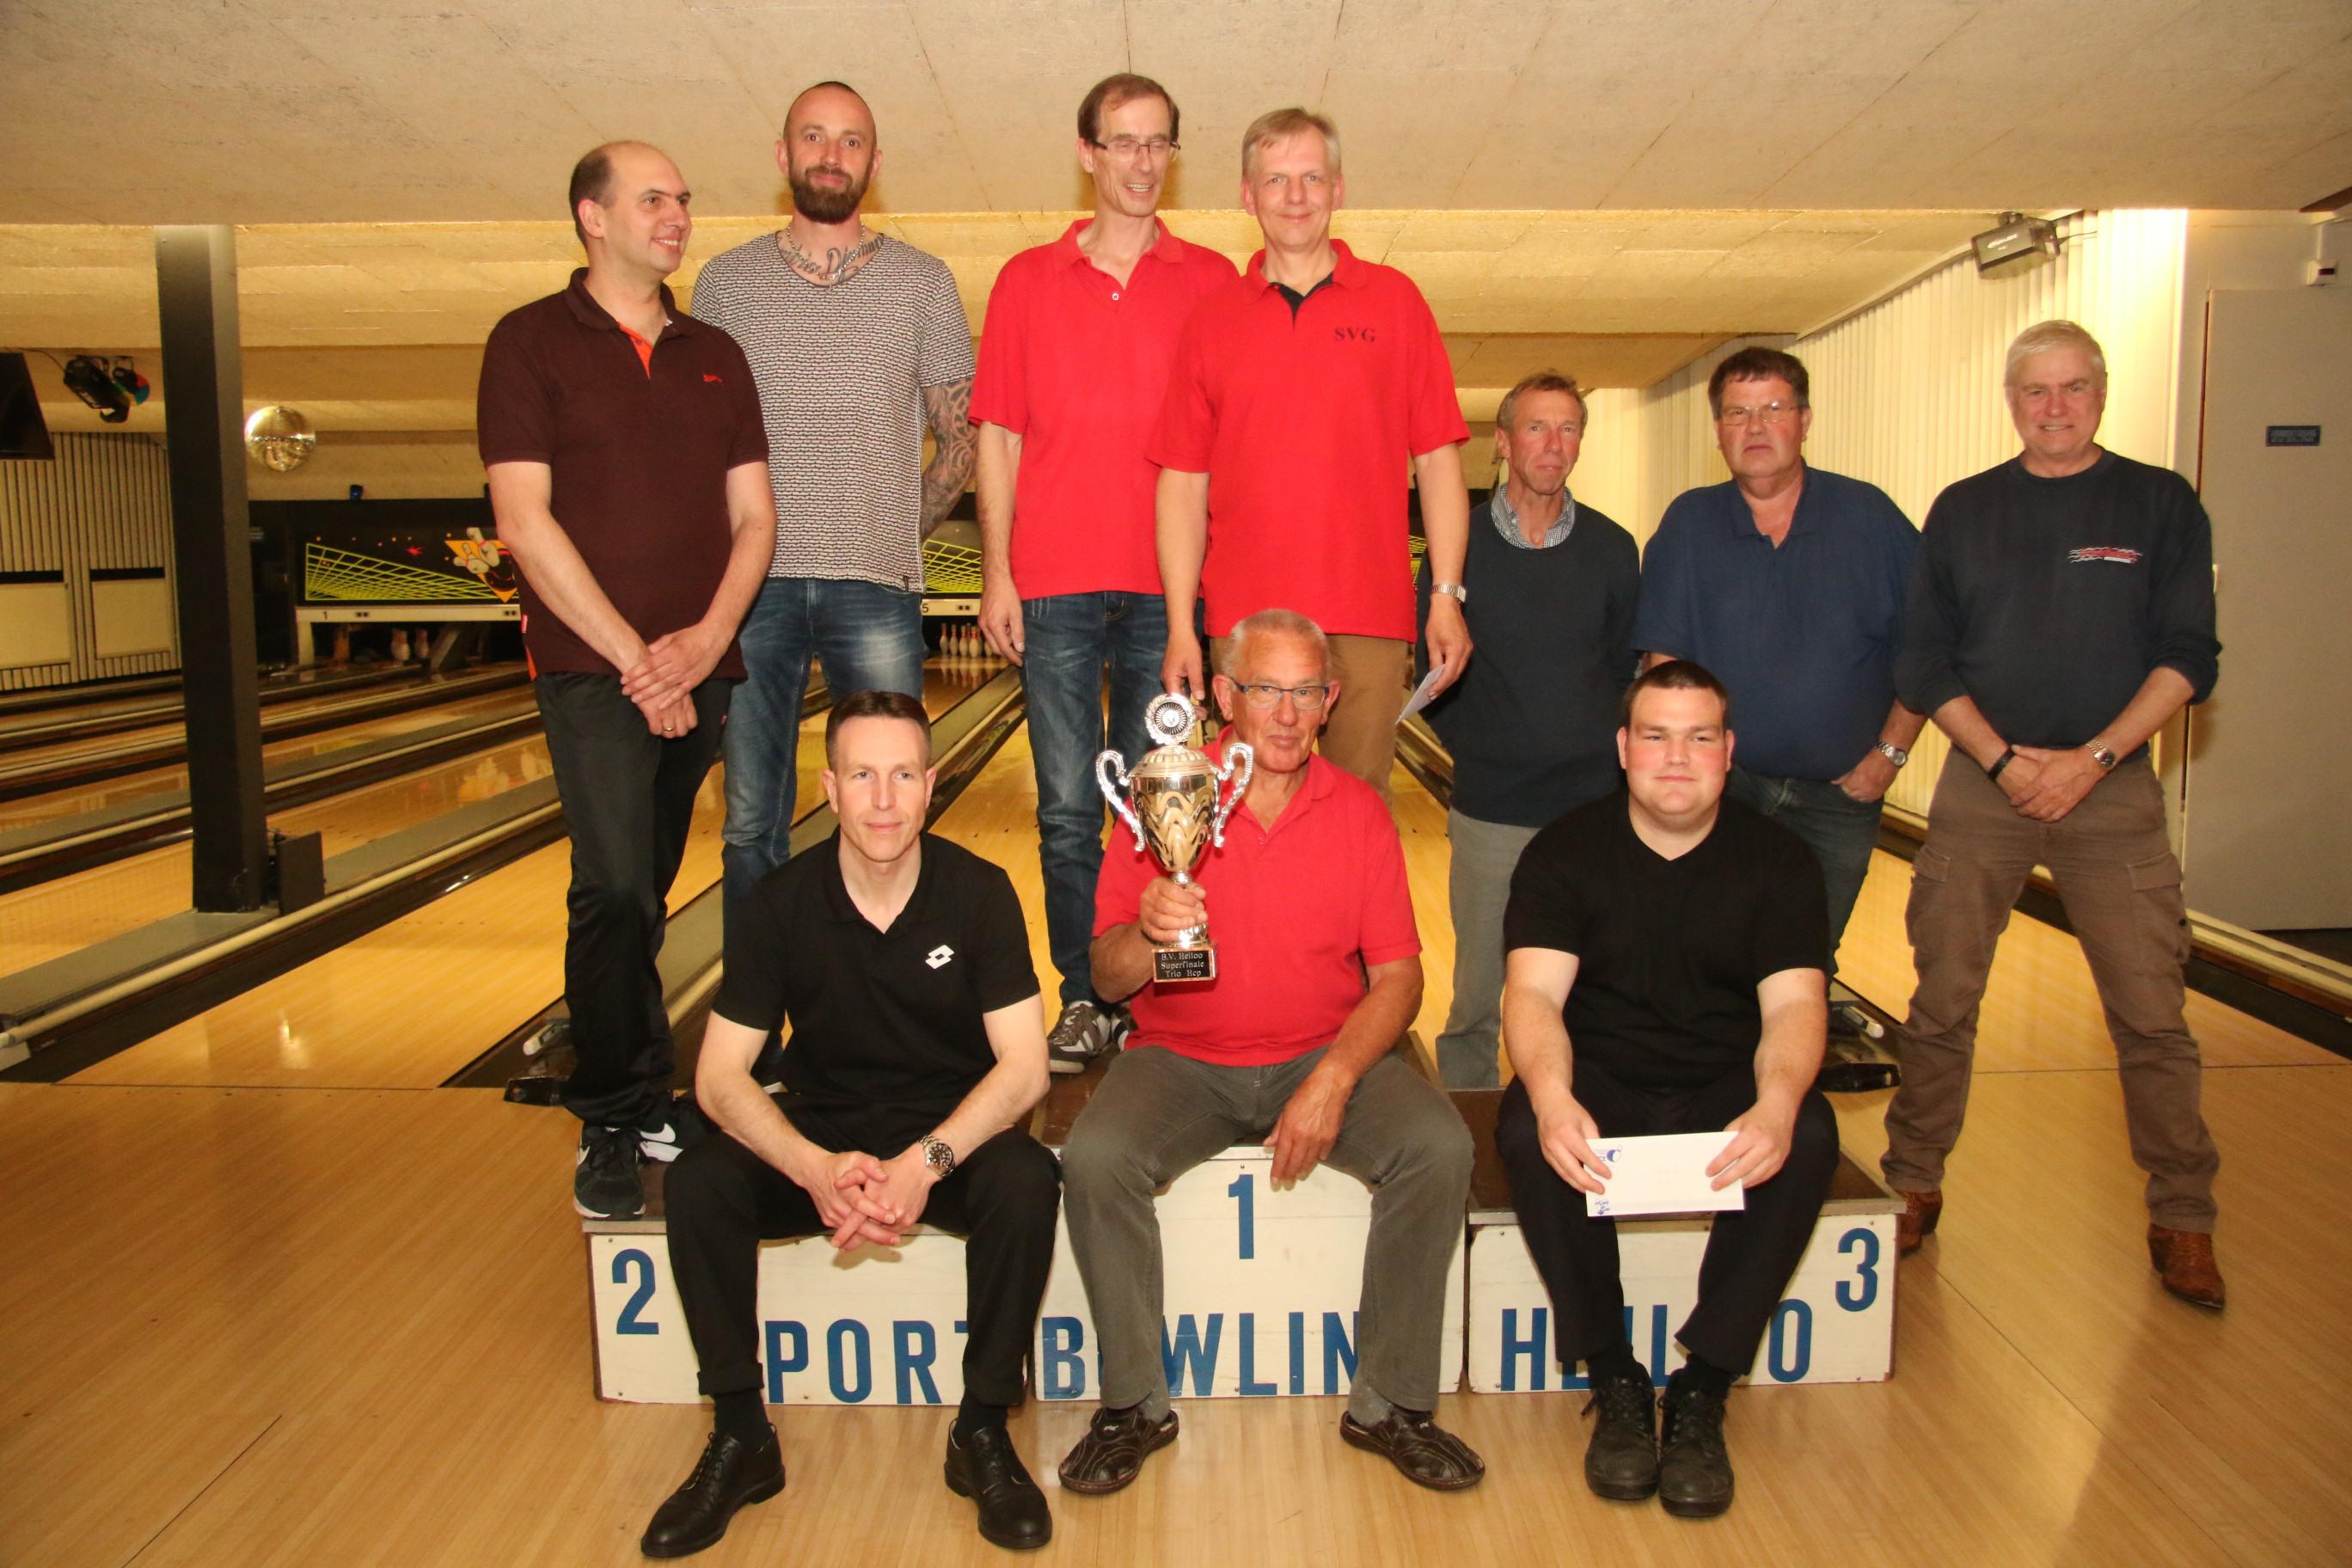 http://www.bowlingverenigingheiloo.nl/fotos_verhalen/foto's/2016_0525-SupFin-Hcp3.jpg